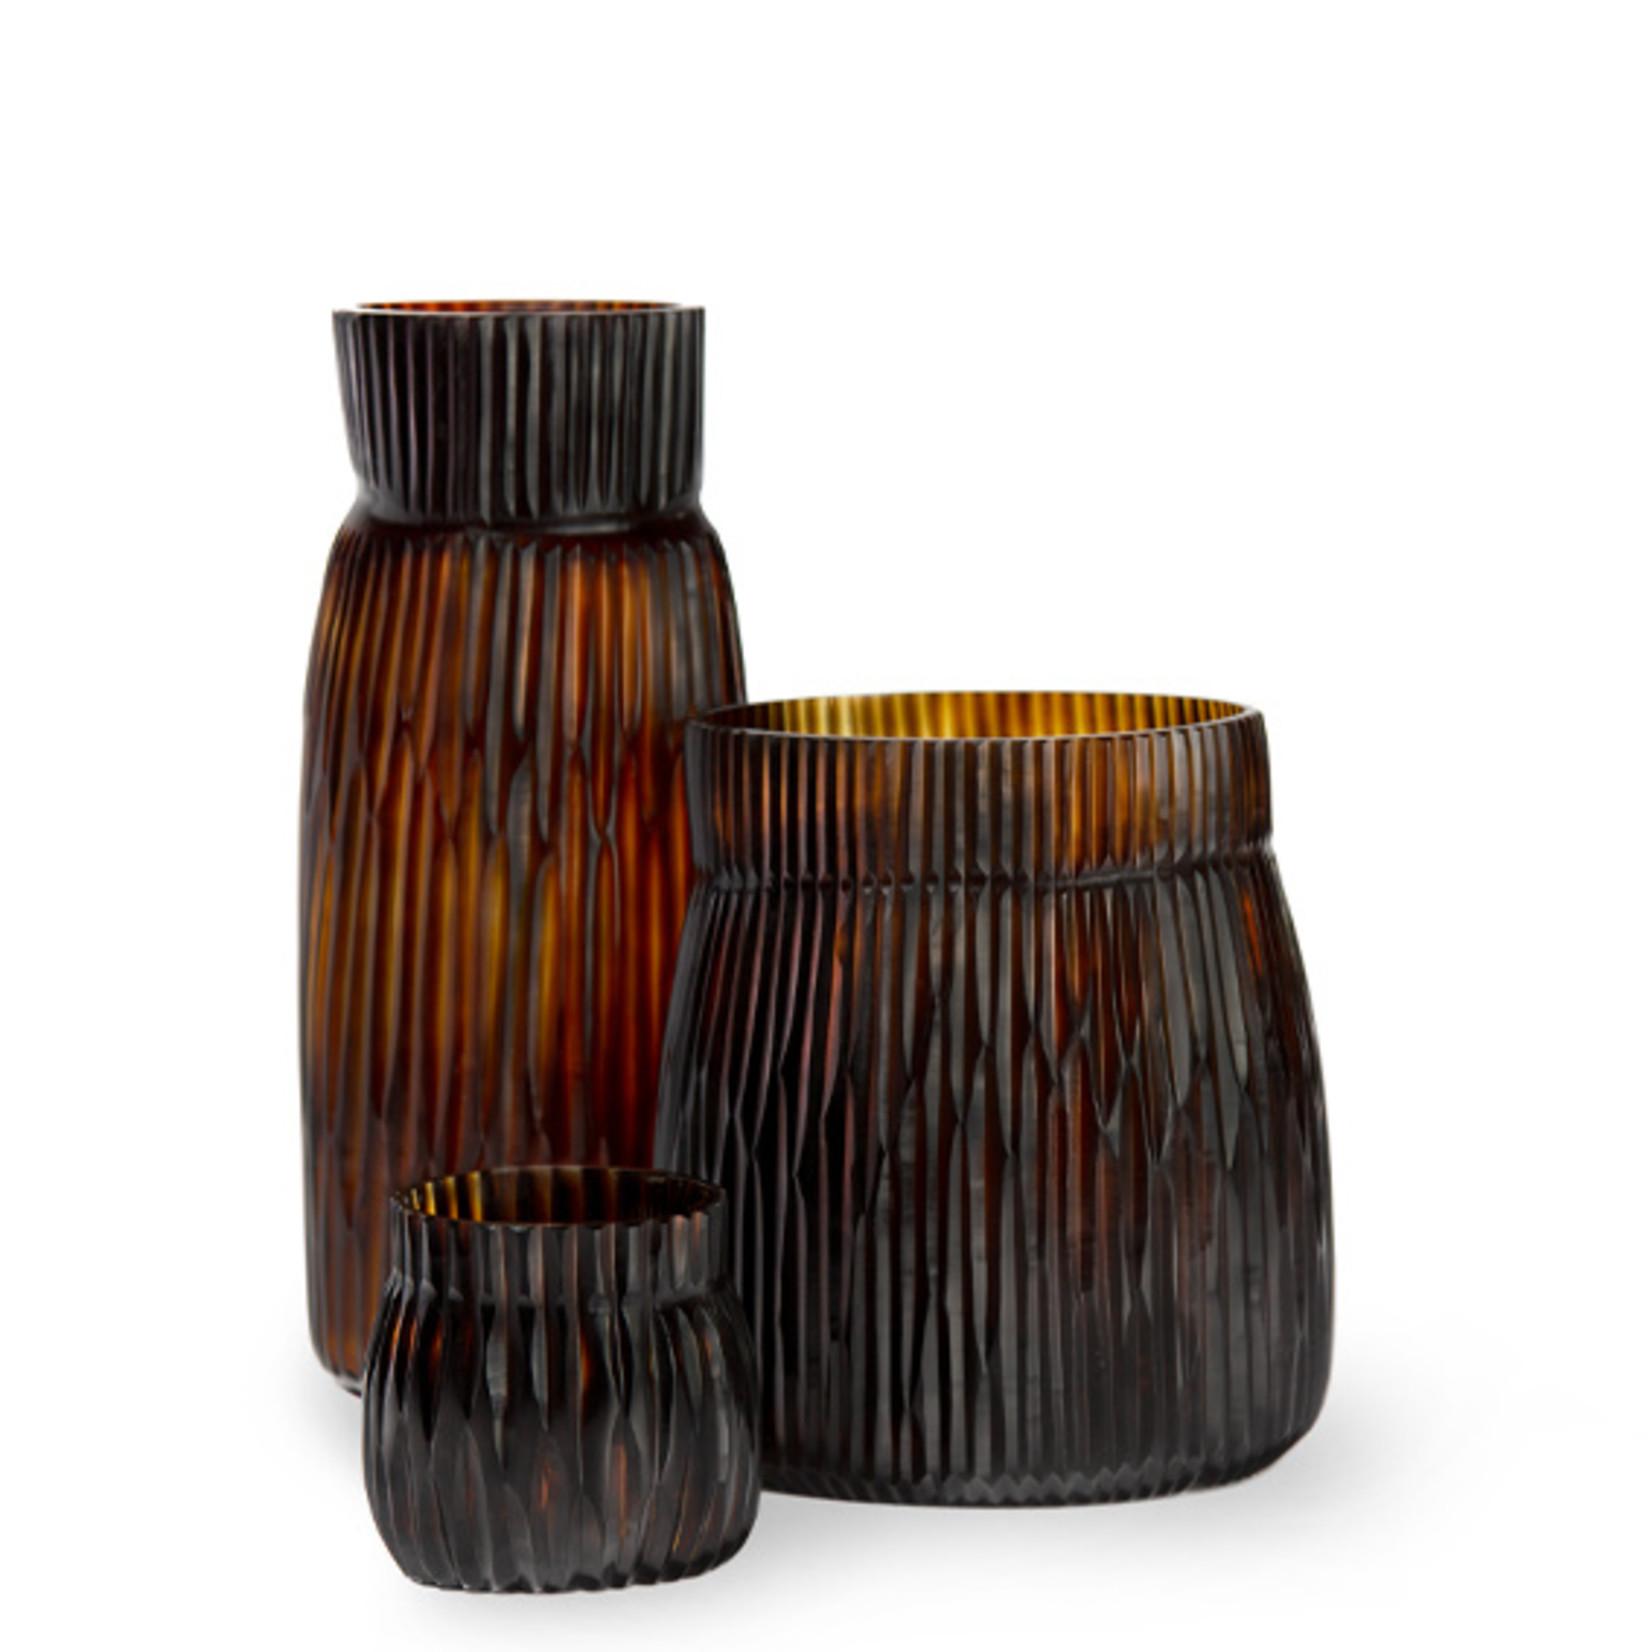 Guaxs Vase Mathura Tall | Butter / Brown